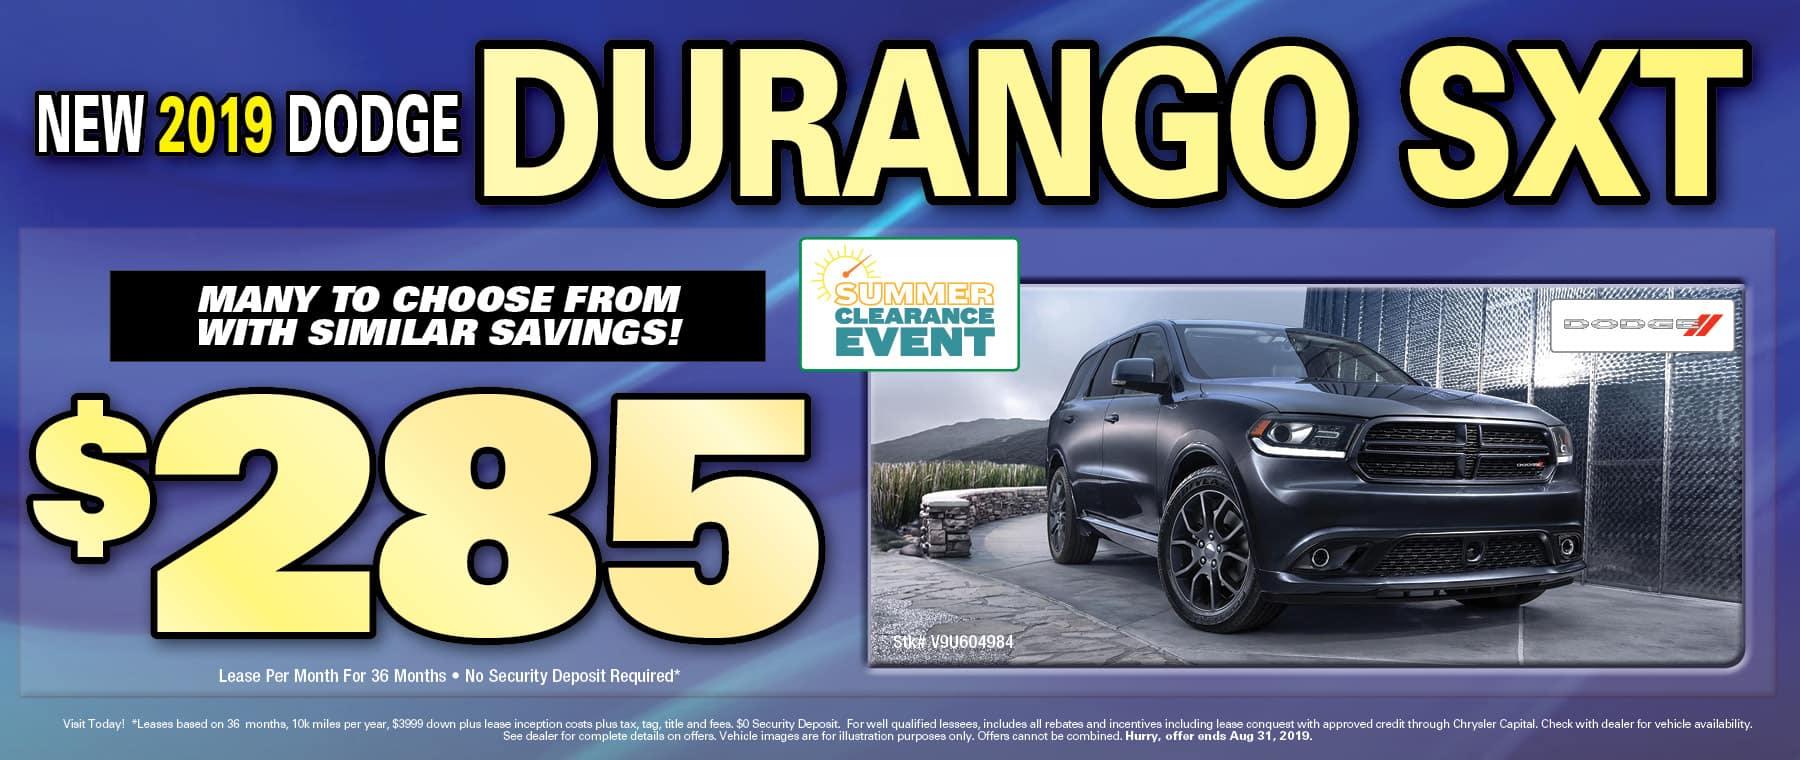 2019 Dodge Durangos